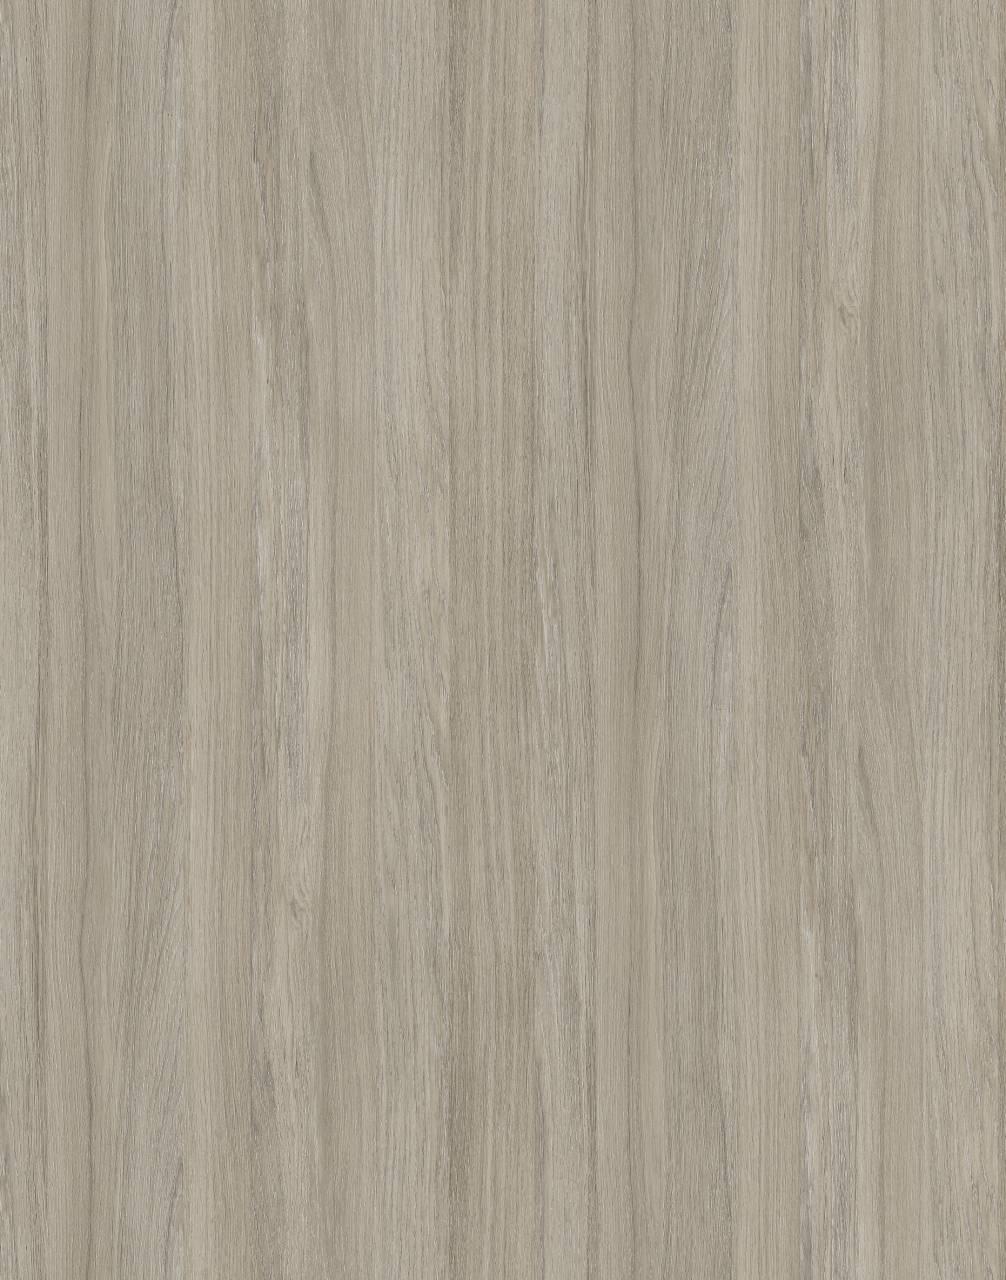 K005 Oyster Urban Oak (MF PB sample)